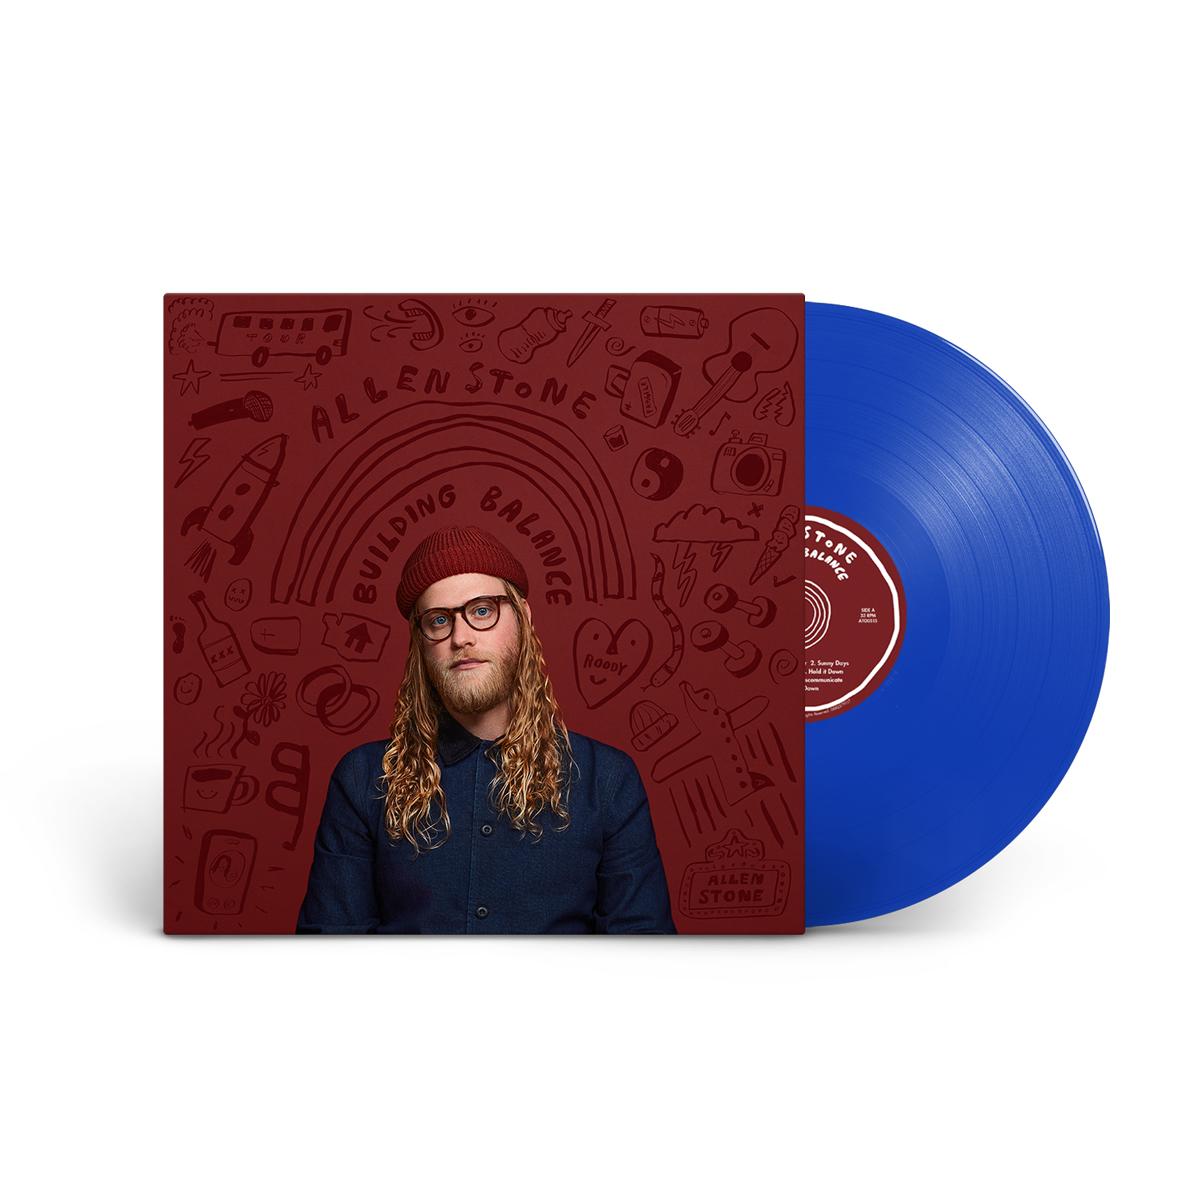 Allen Stone – Building Balance – Limited Edition Vinyl (translucent blue)